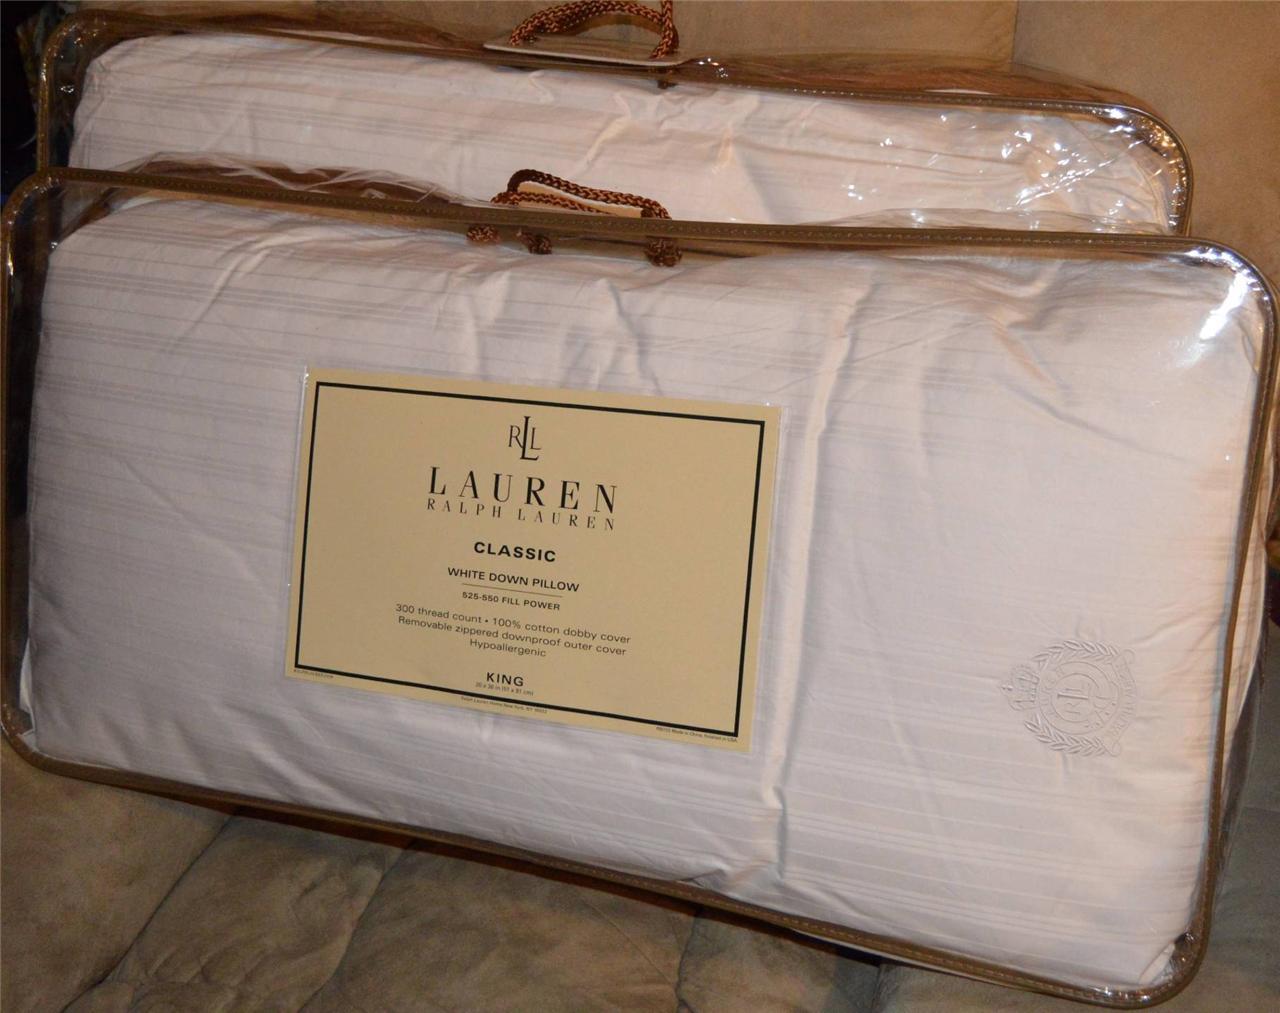 2 Ralph Lauren Classic White Goose Down King Pillows New